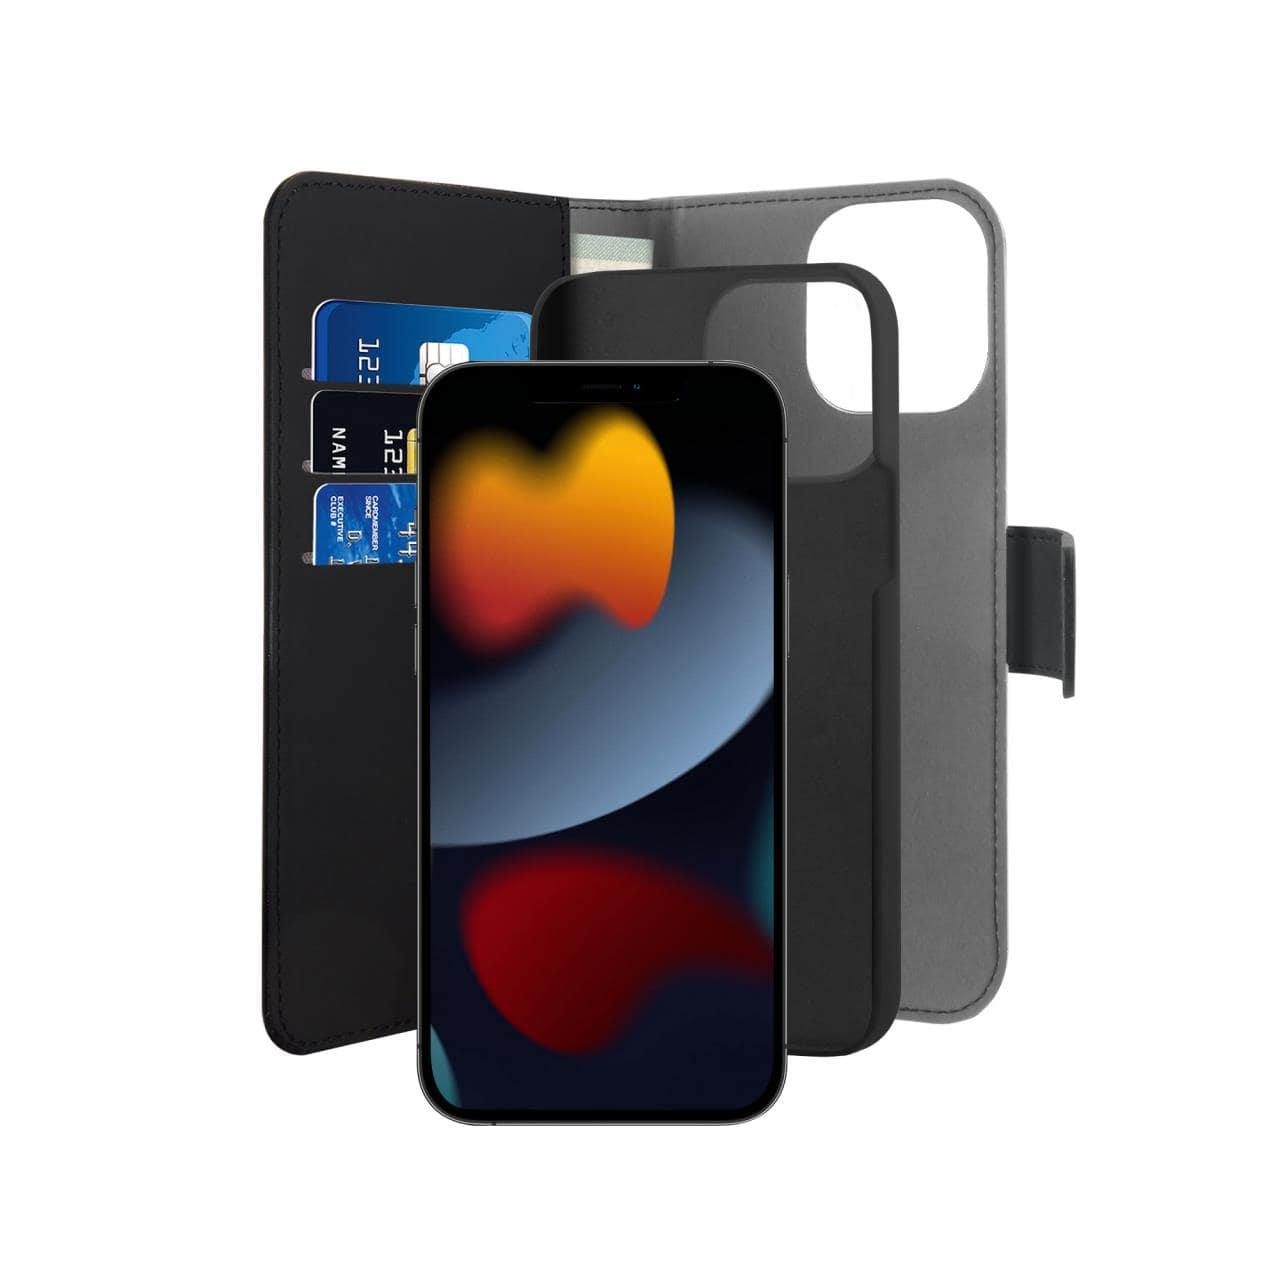 puro-custodia-wallet-detachable-iphone-13-pro-max_01-min